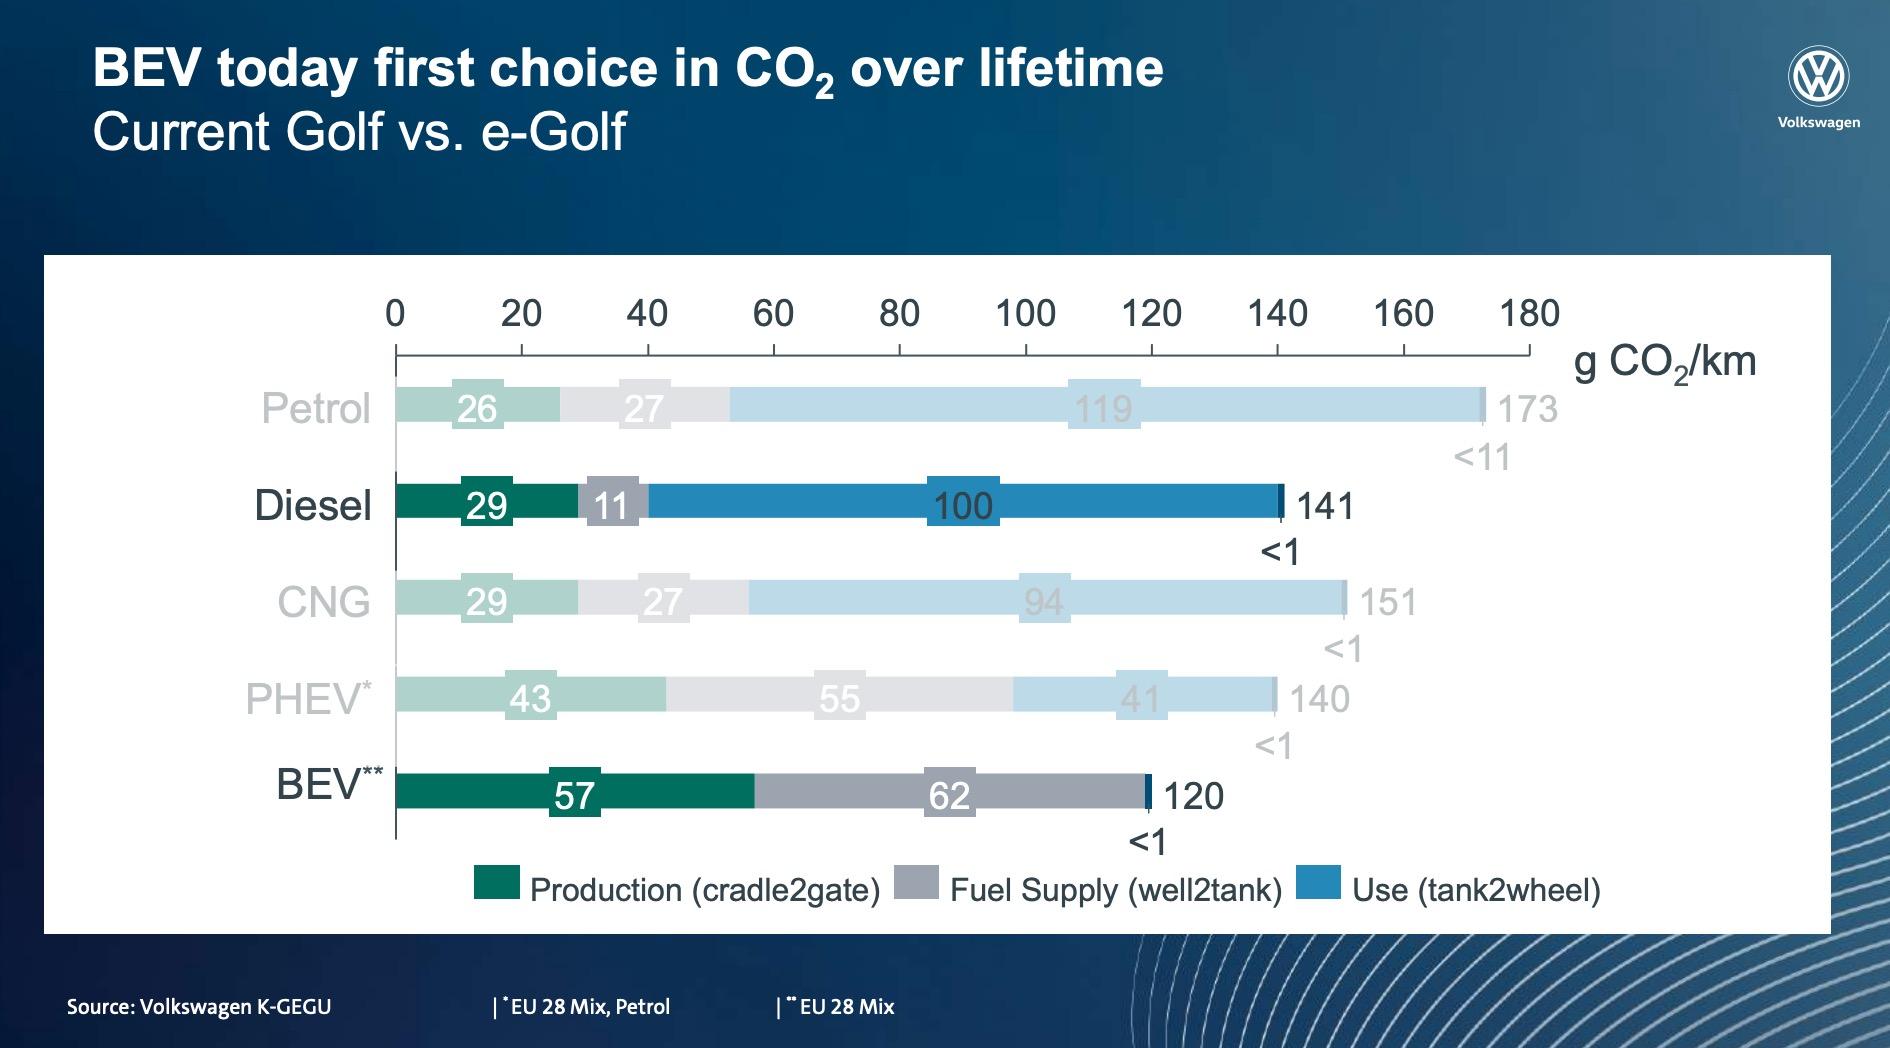 Volkswagen CO2 emissions